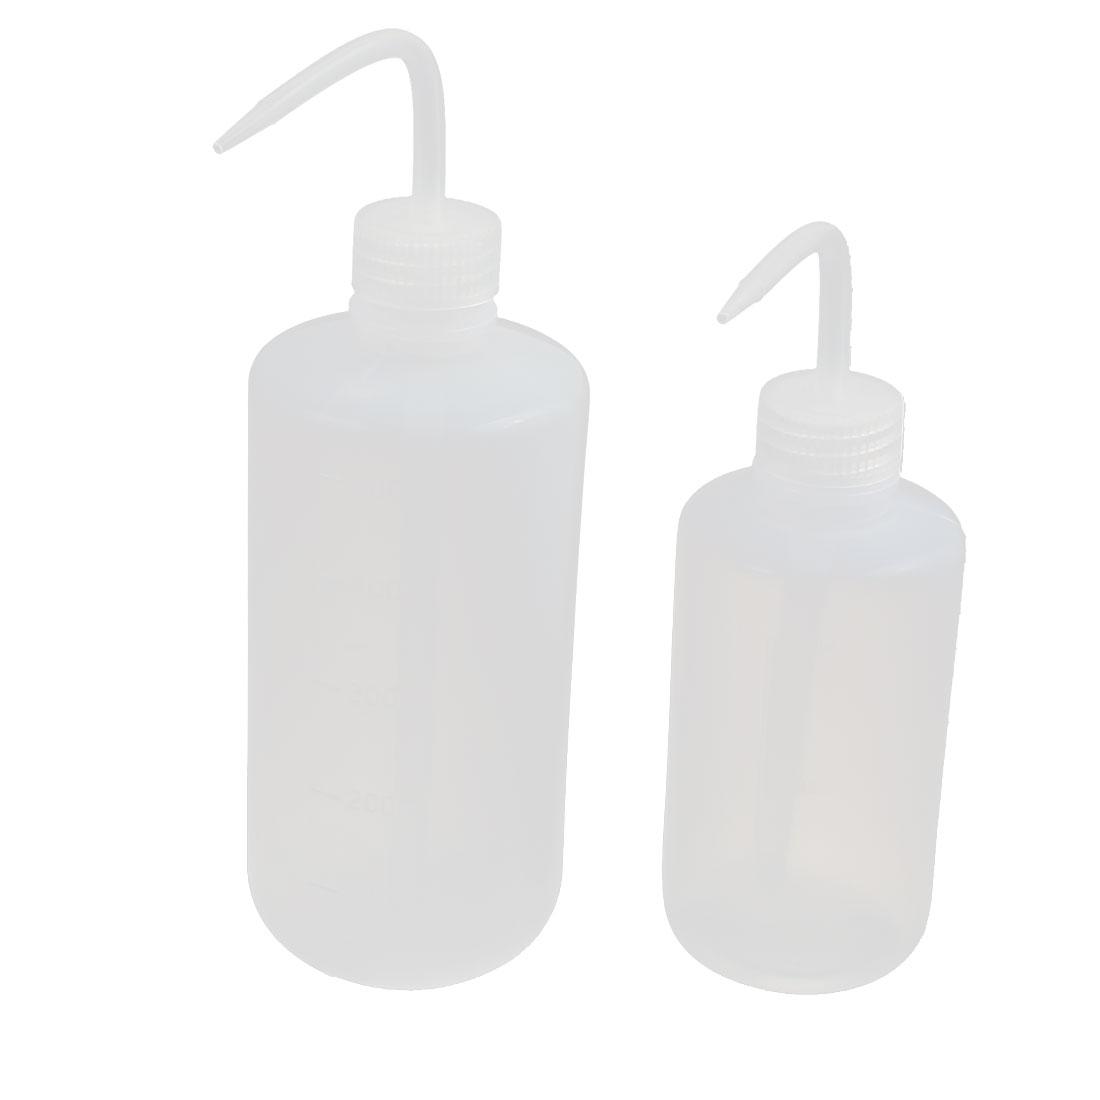 2Pcs 250ml/500ml LDPE Economy Wash Bottles Squeeze Bottles Label Tattoo